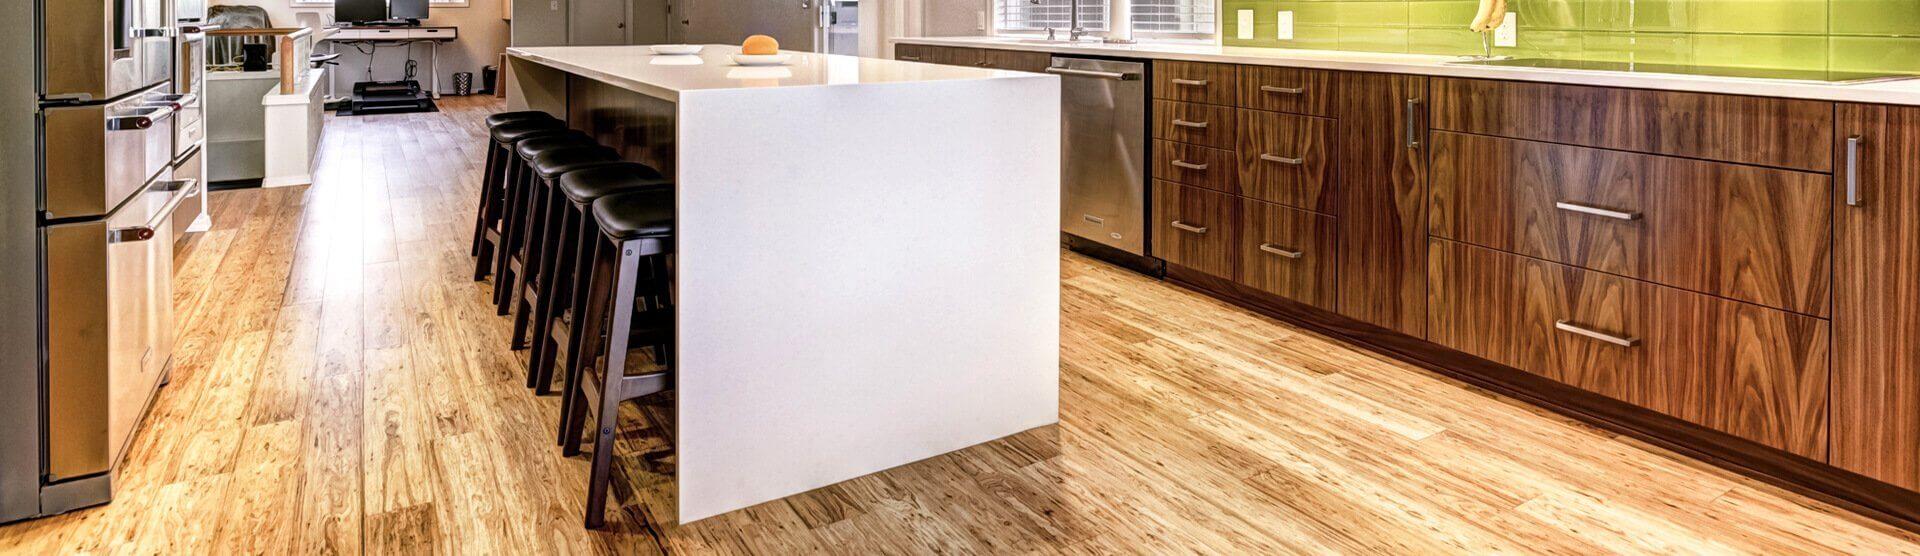 Bamboo Flooring Options & Samples | Ambient® Bamboo Flooring